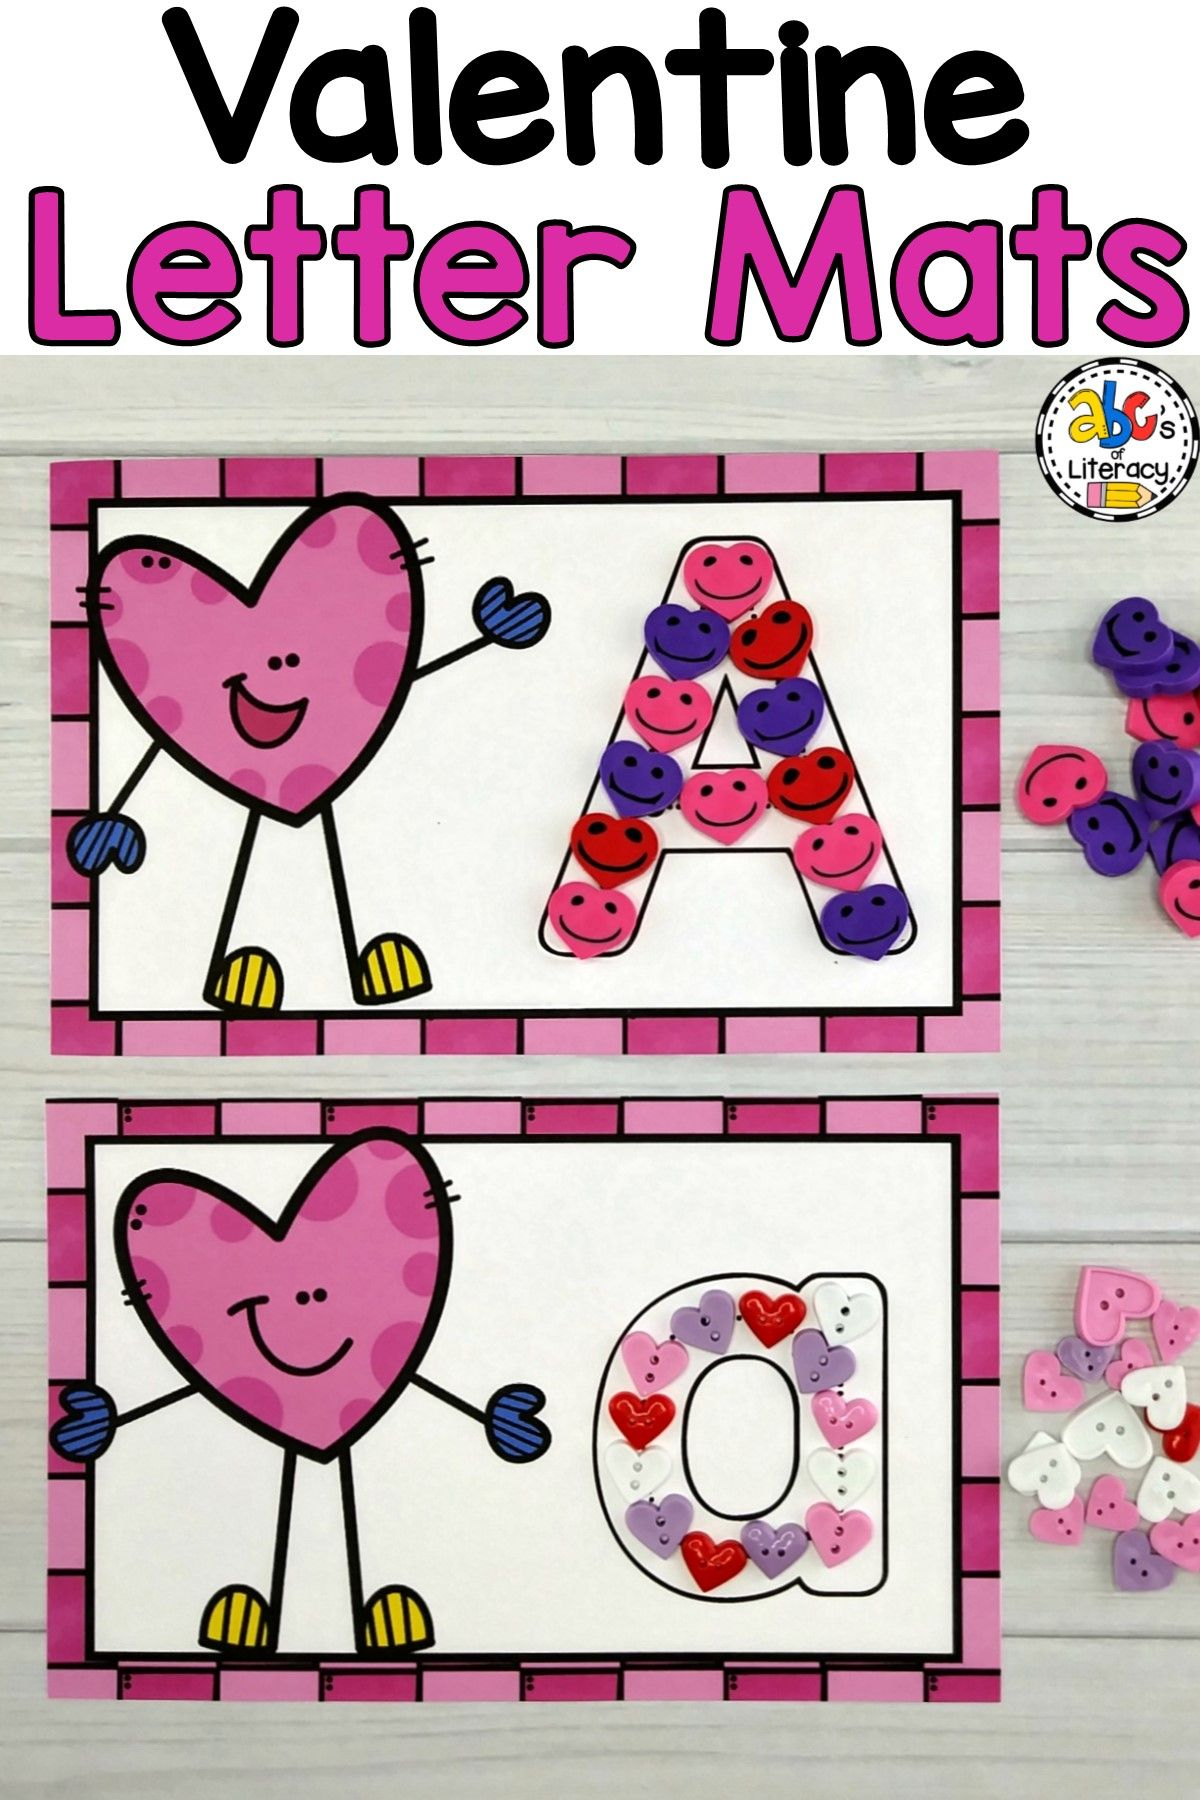 Valentine Letter Mats